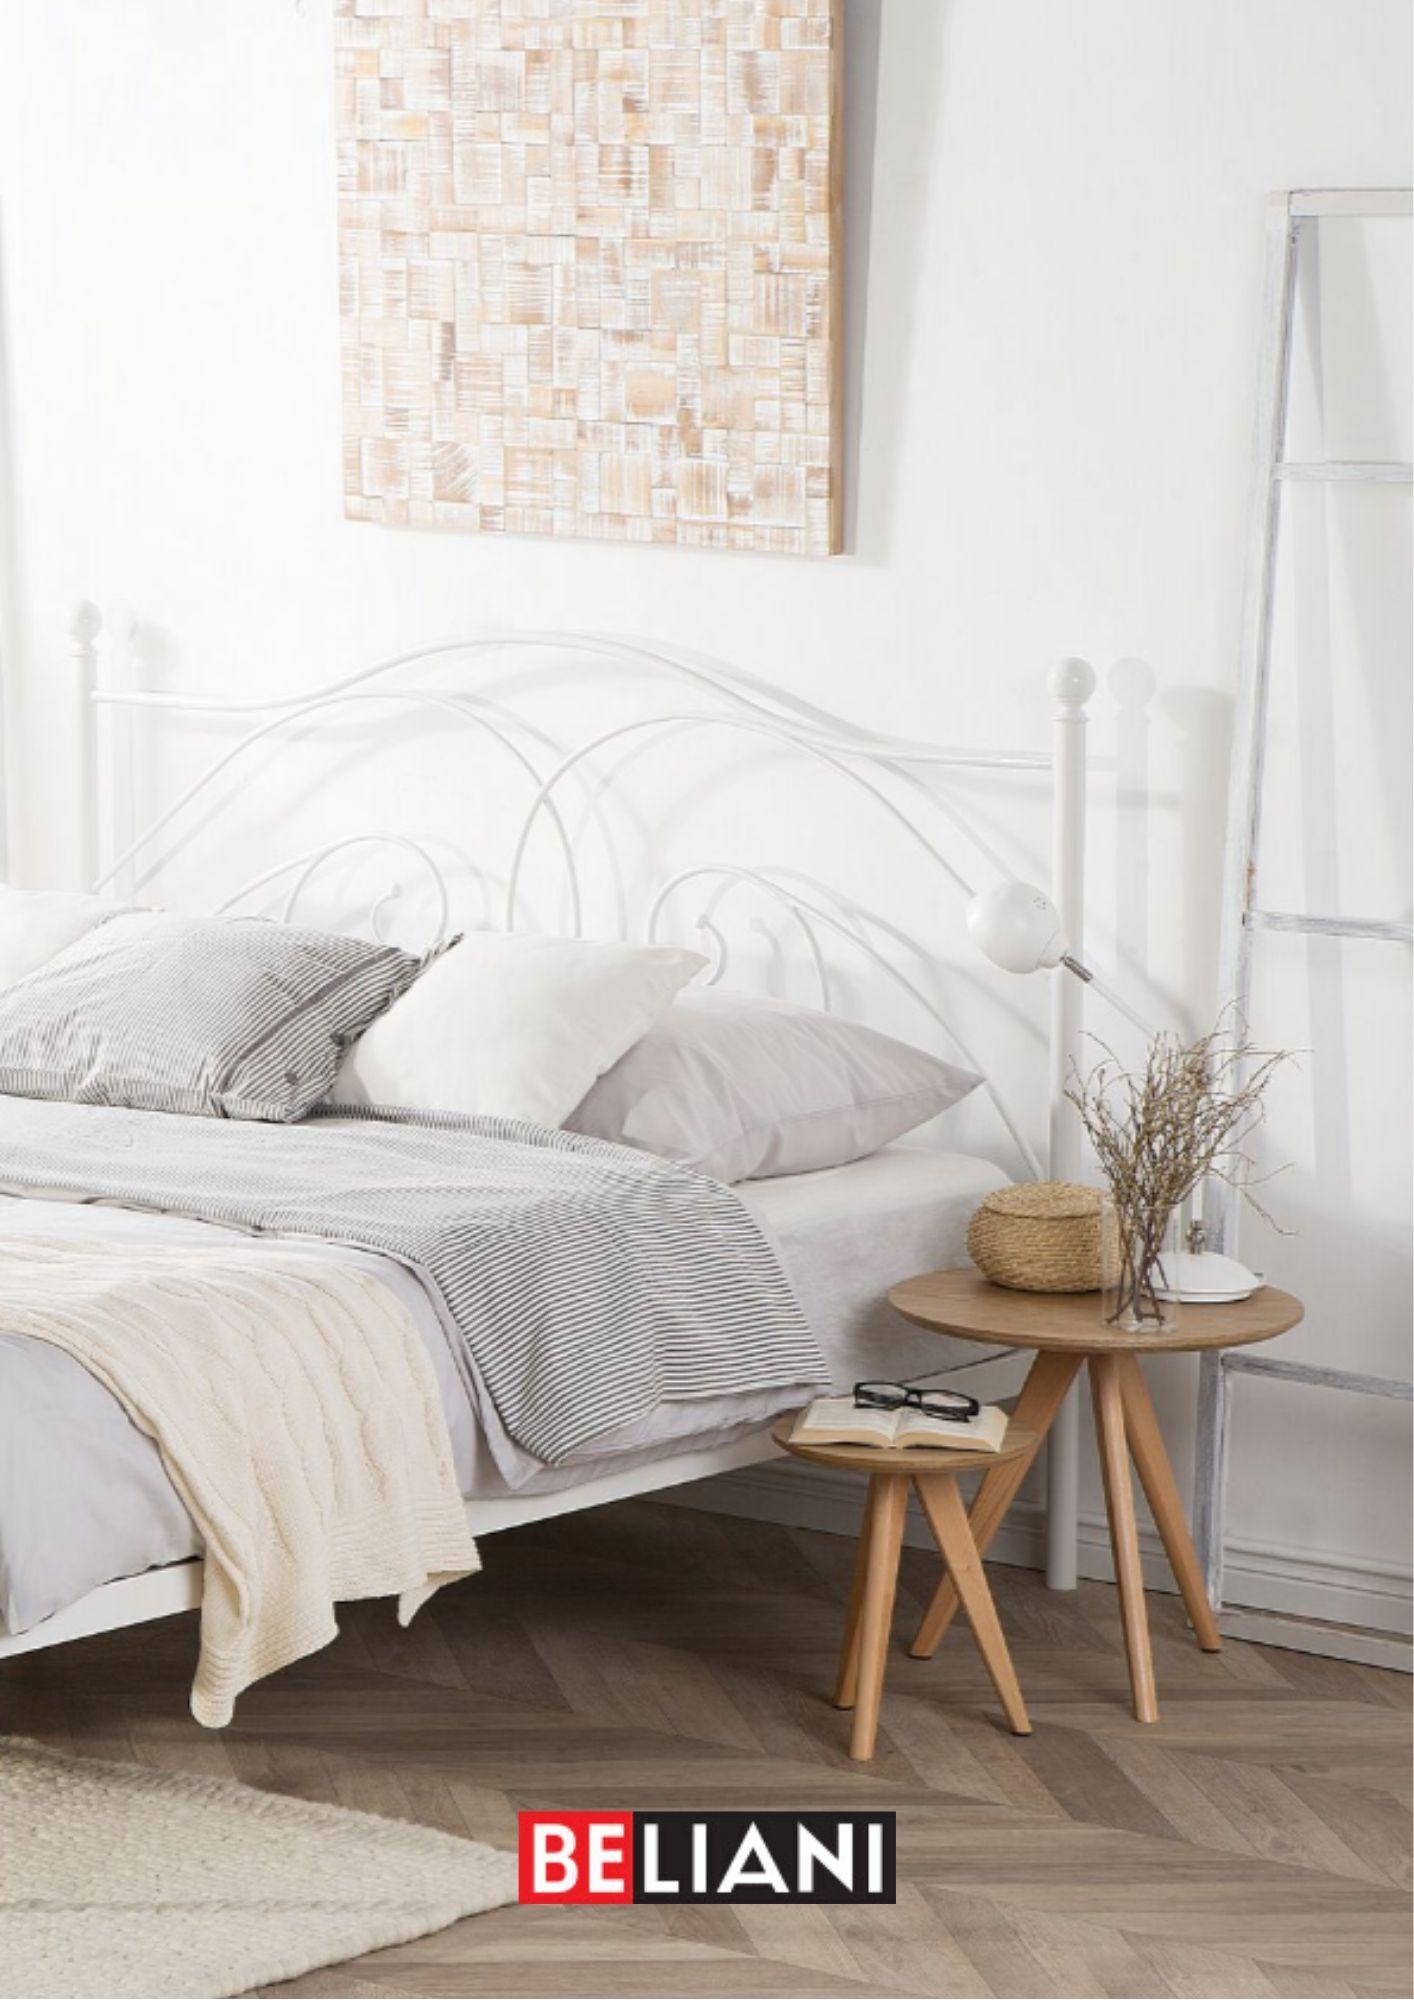 Metallbett Weiss Lattenrost 140 X 200 Cm Dinard In 2020 Furniture Home Decor Bed